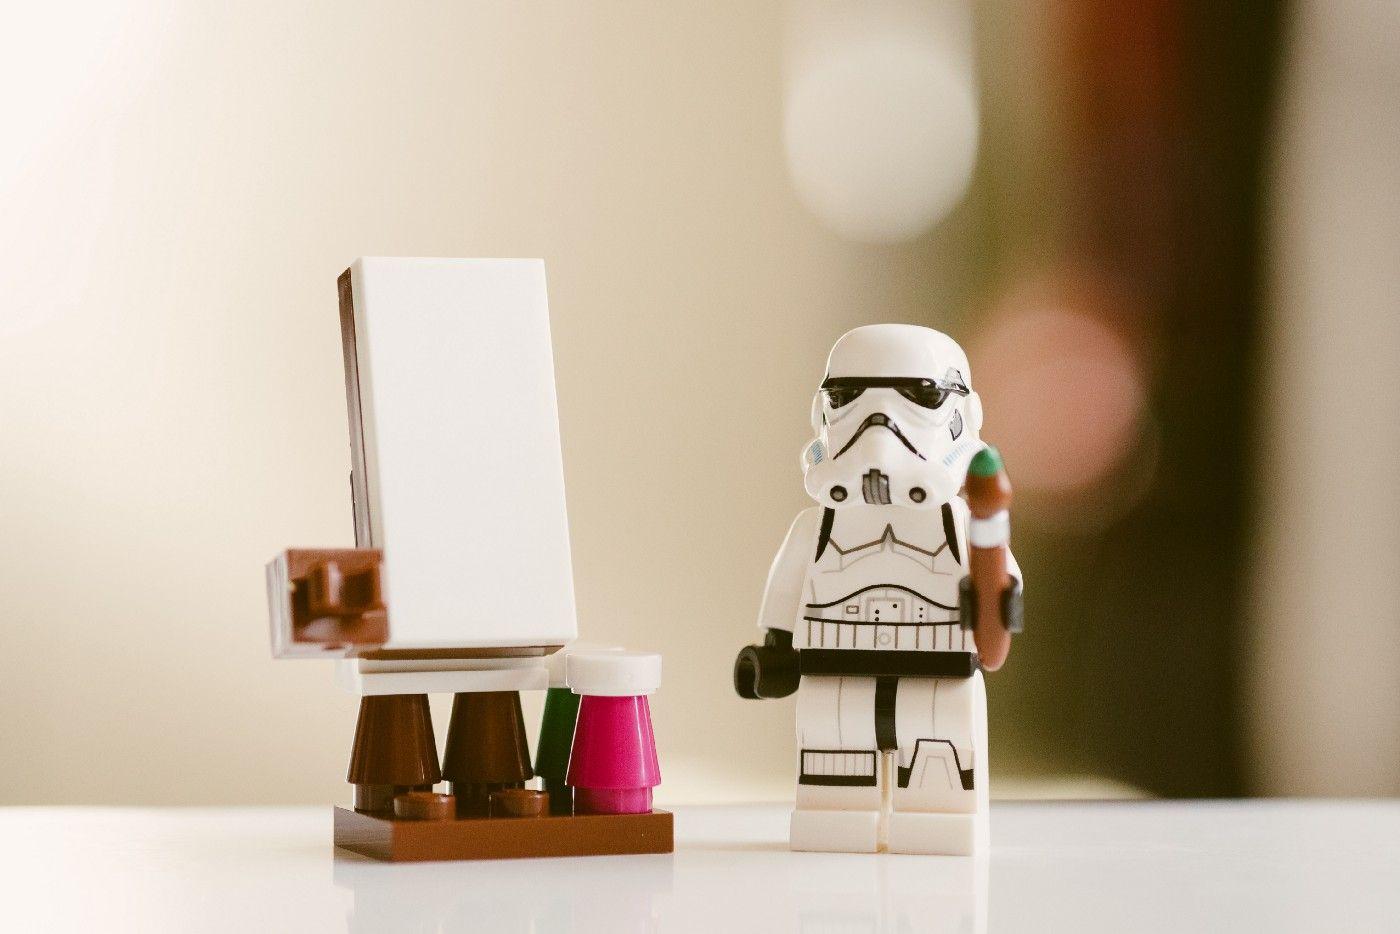 Photo star wars lego